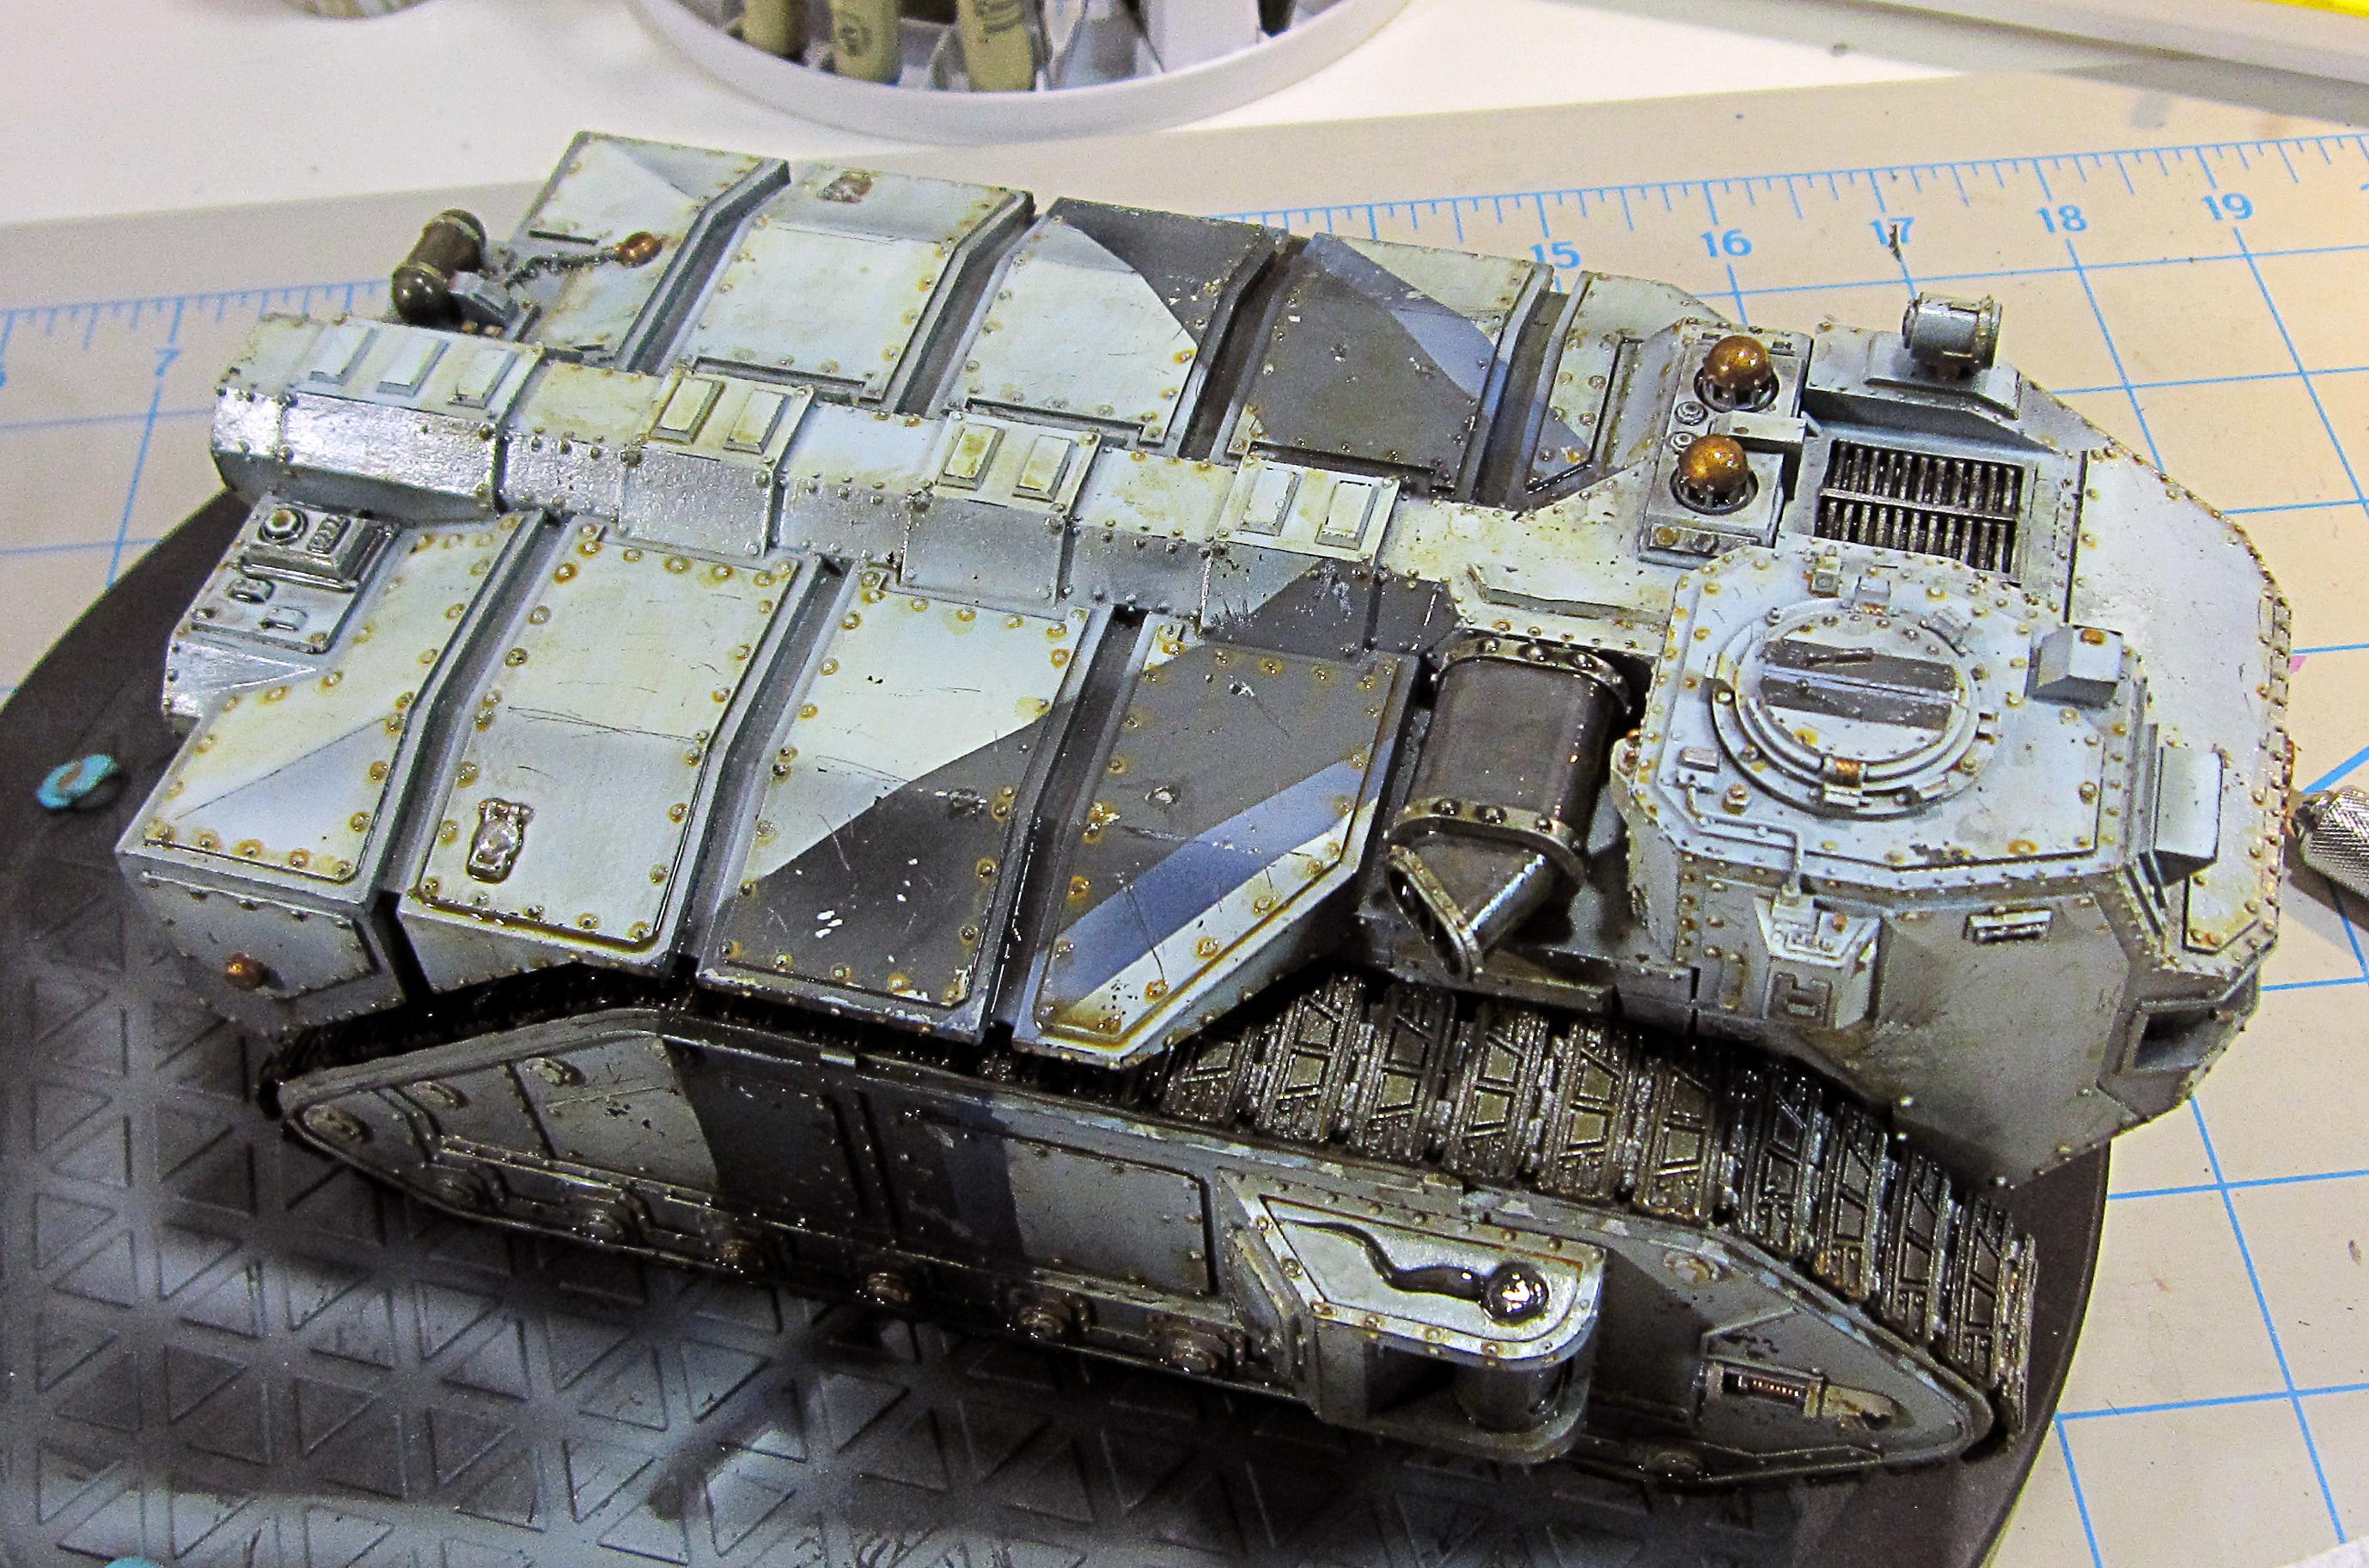 Crassus, Cult, Forge World, Genestealer, Hybrid, Imperial Guard, Tank